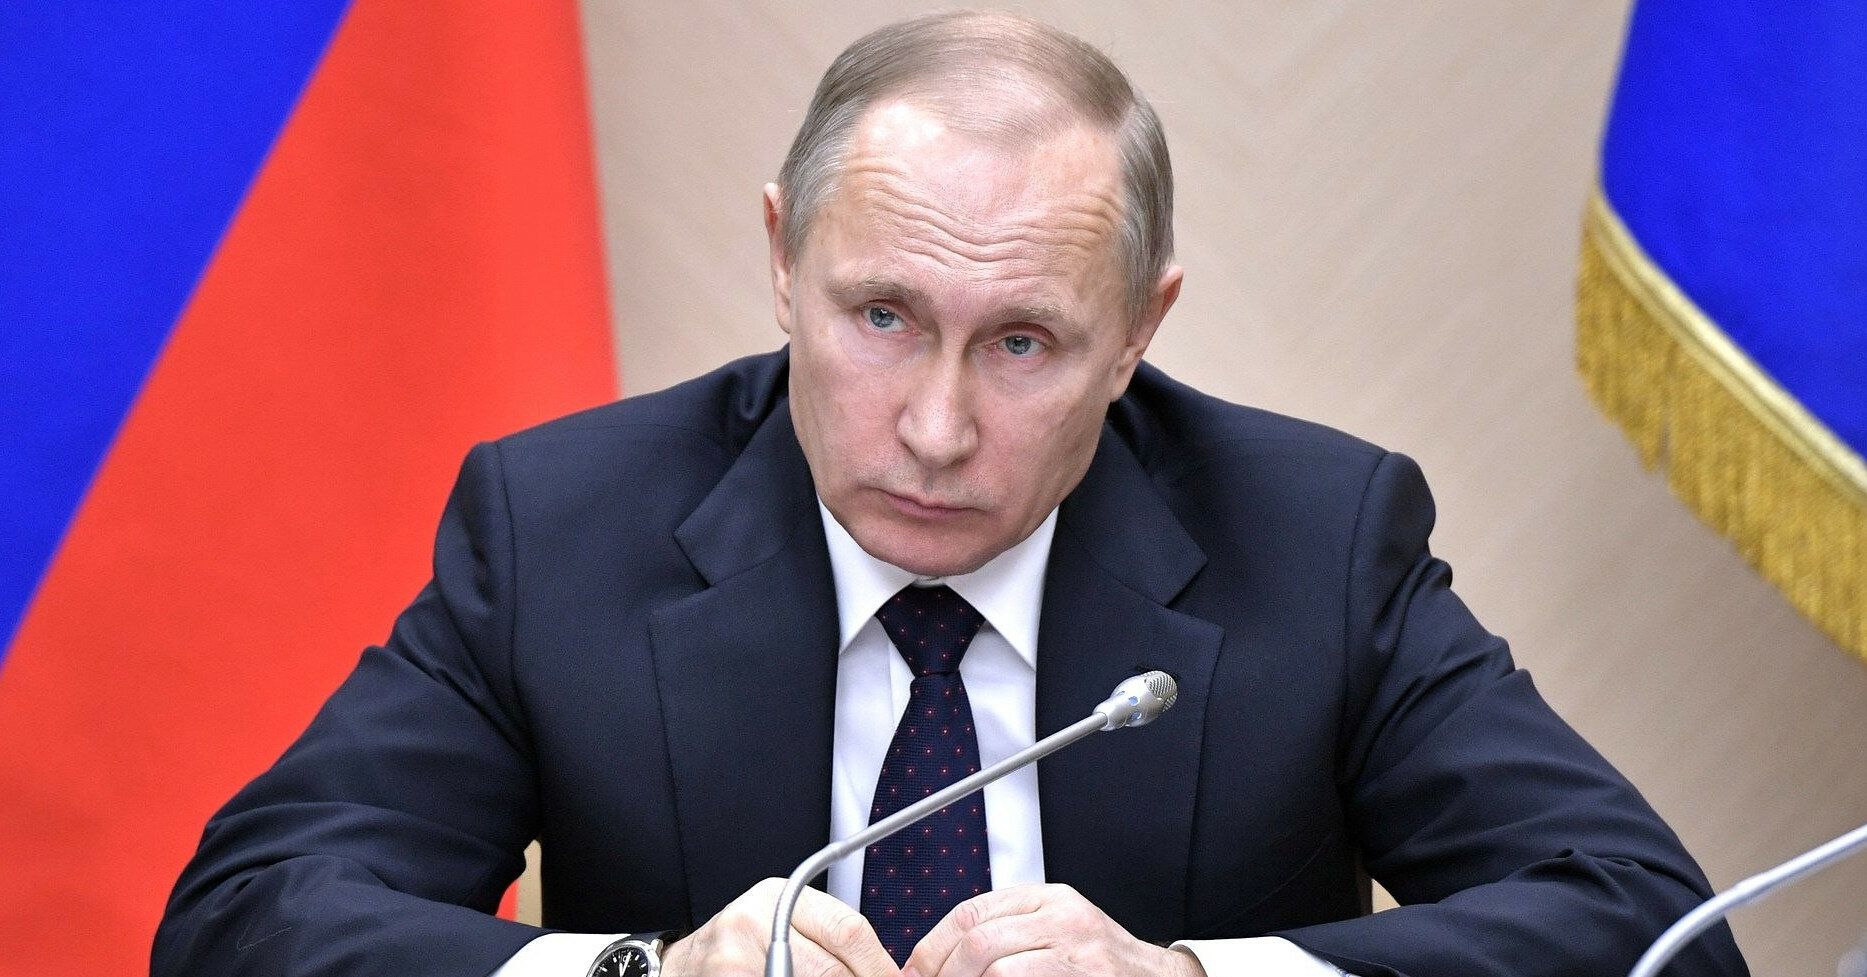 У Путина прокомментировали отказ ЕС от саммита с Россией